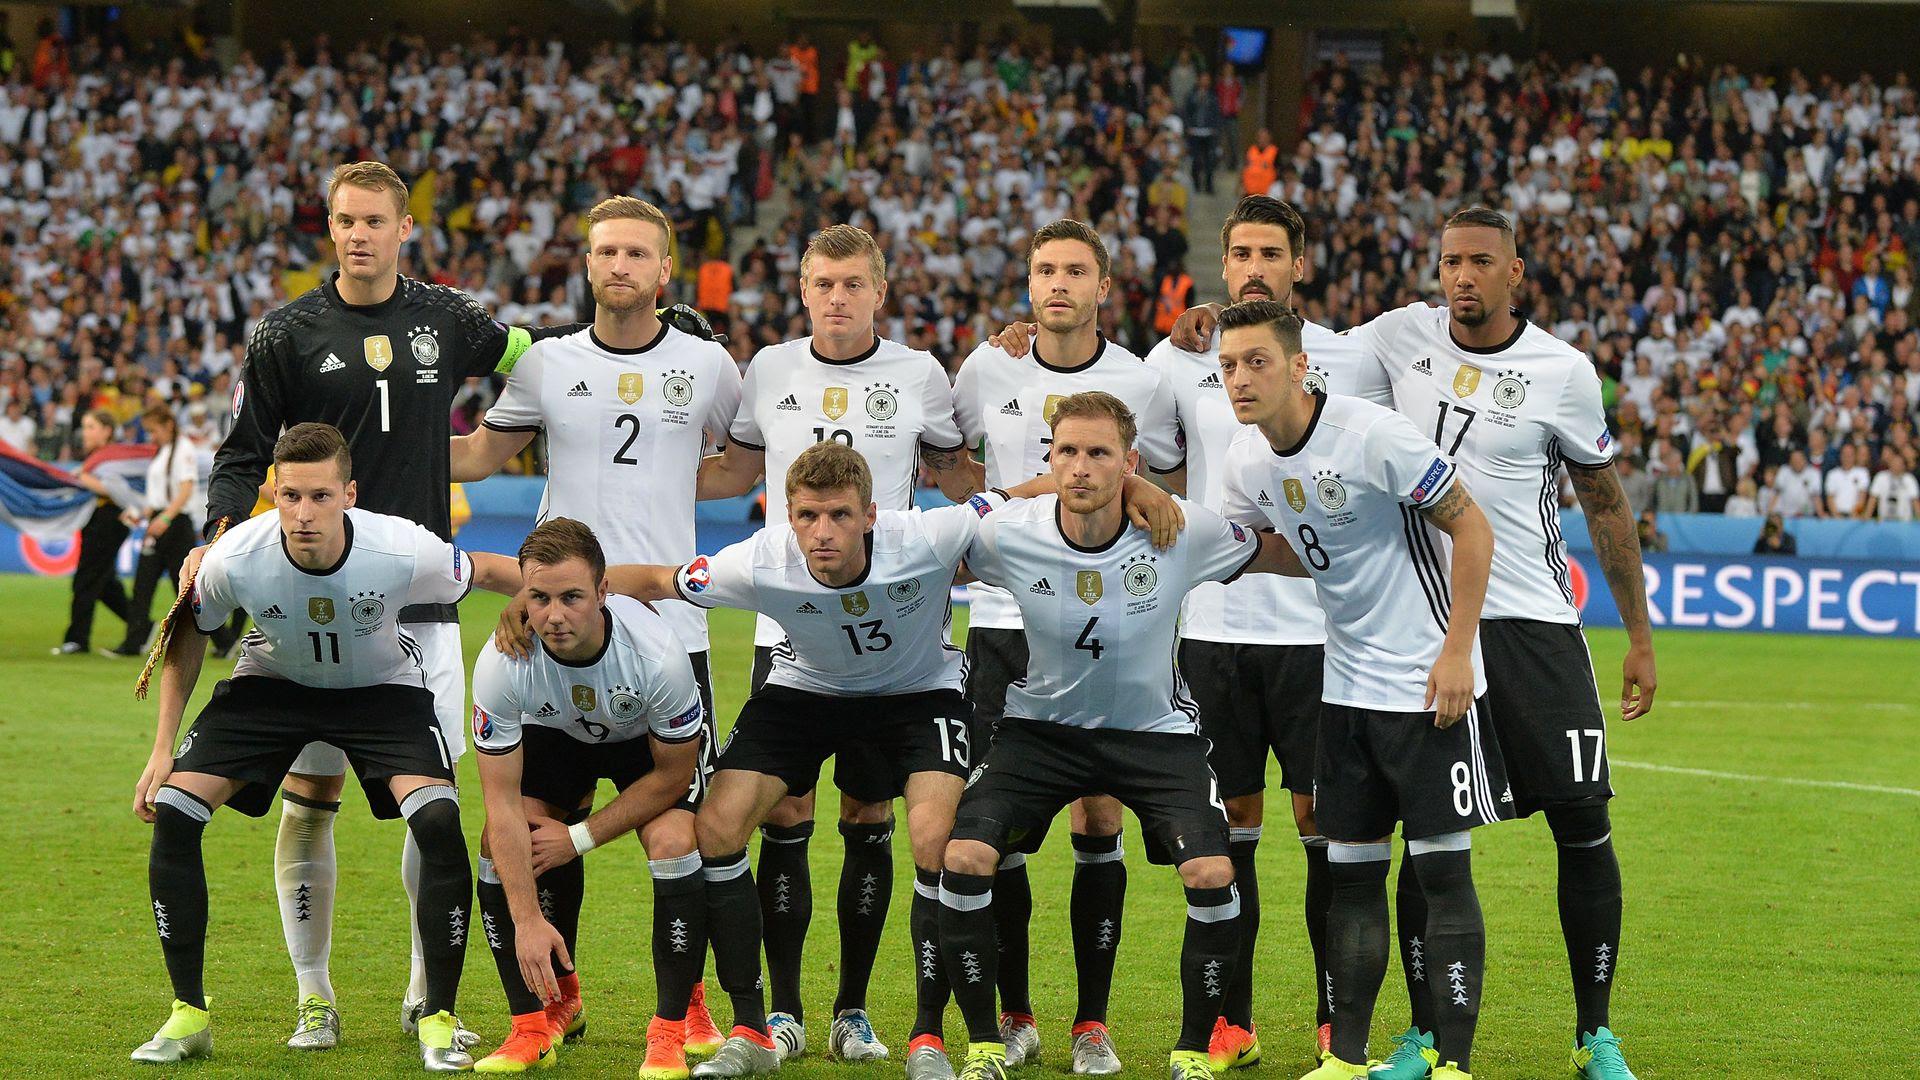 Deutsche Fussballnationalmannschaft